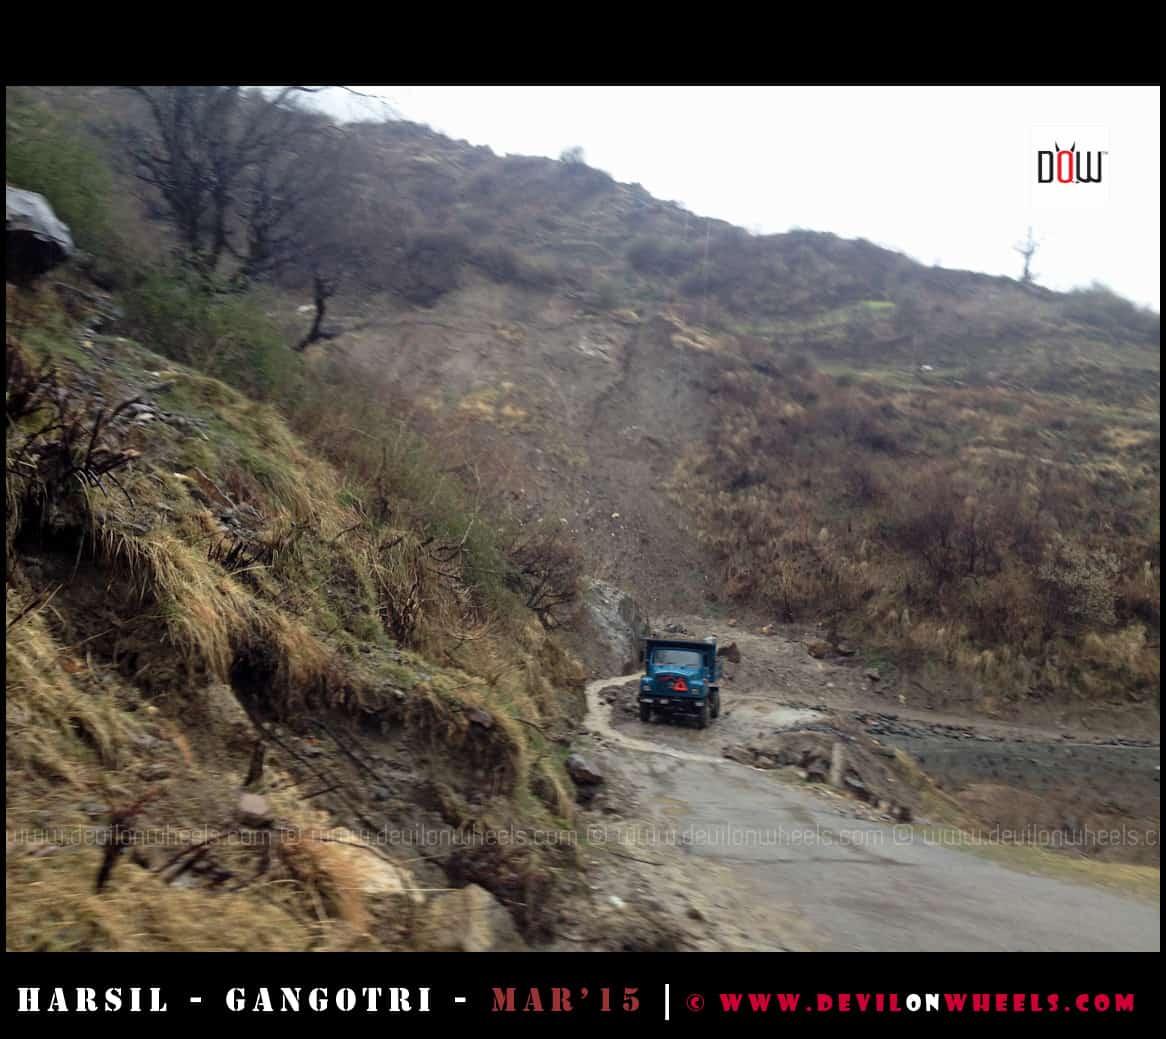 The Roads to Harsil - Gangotri